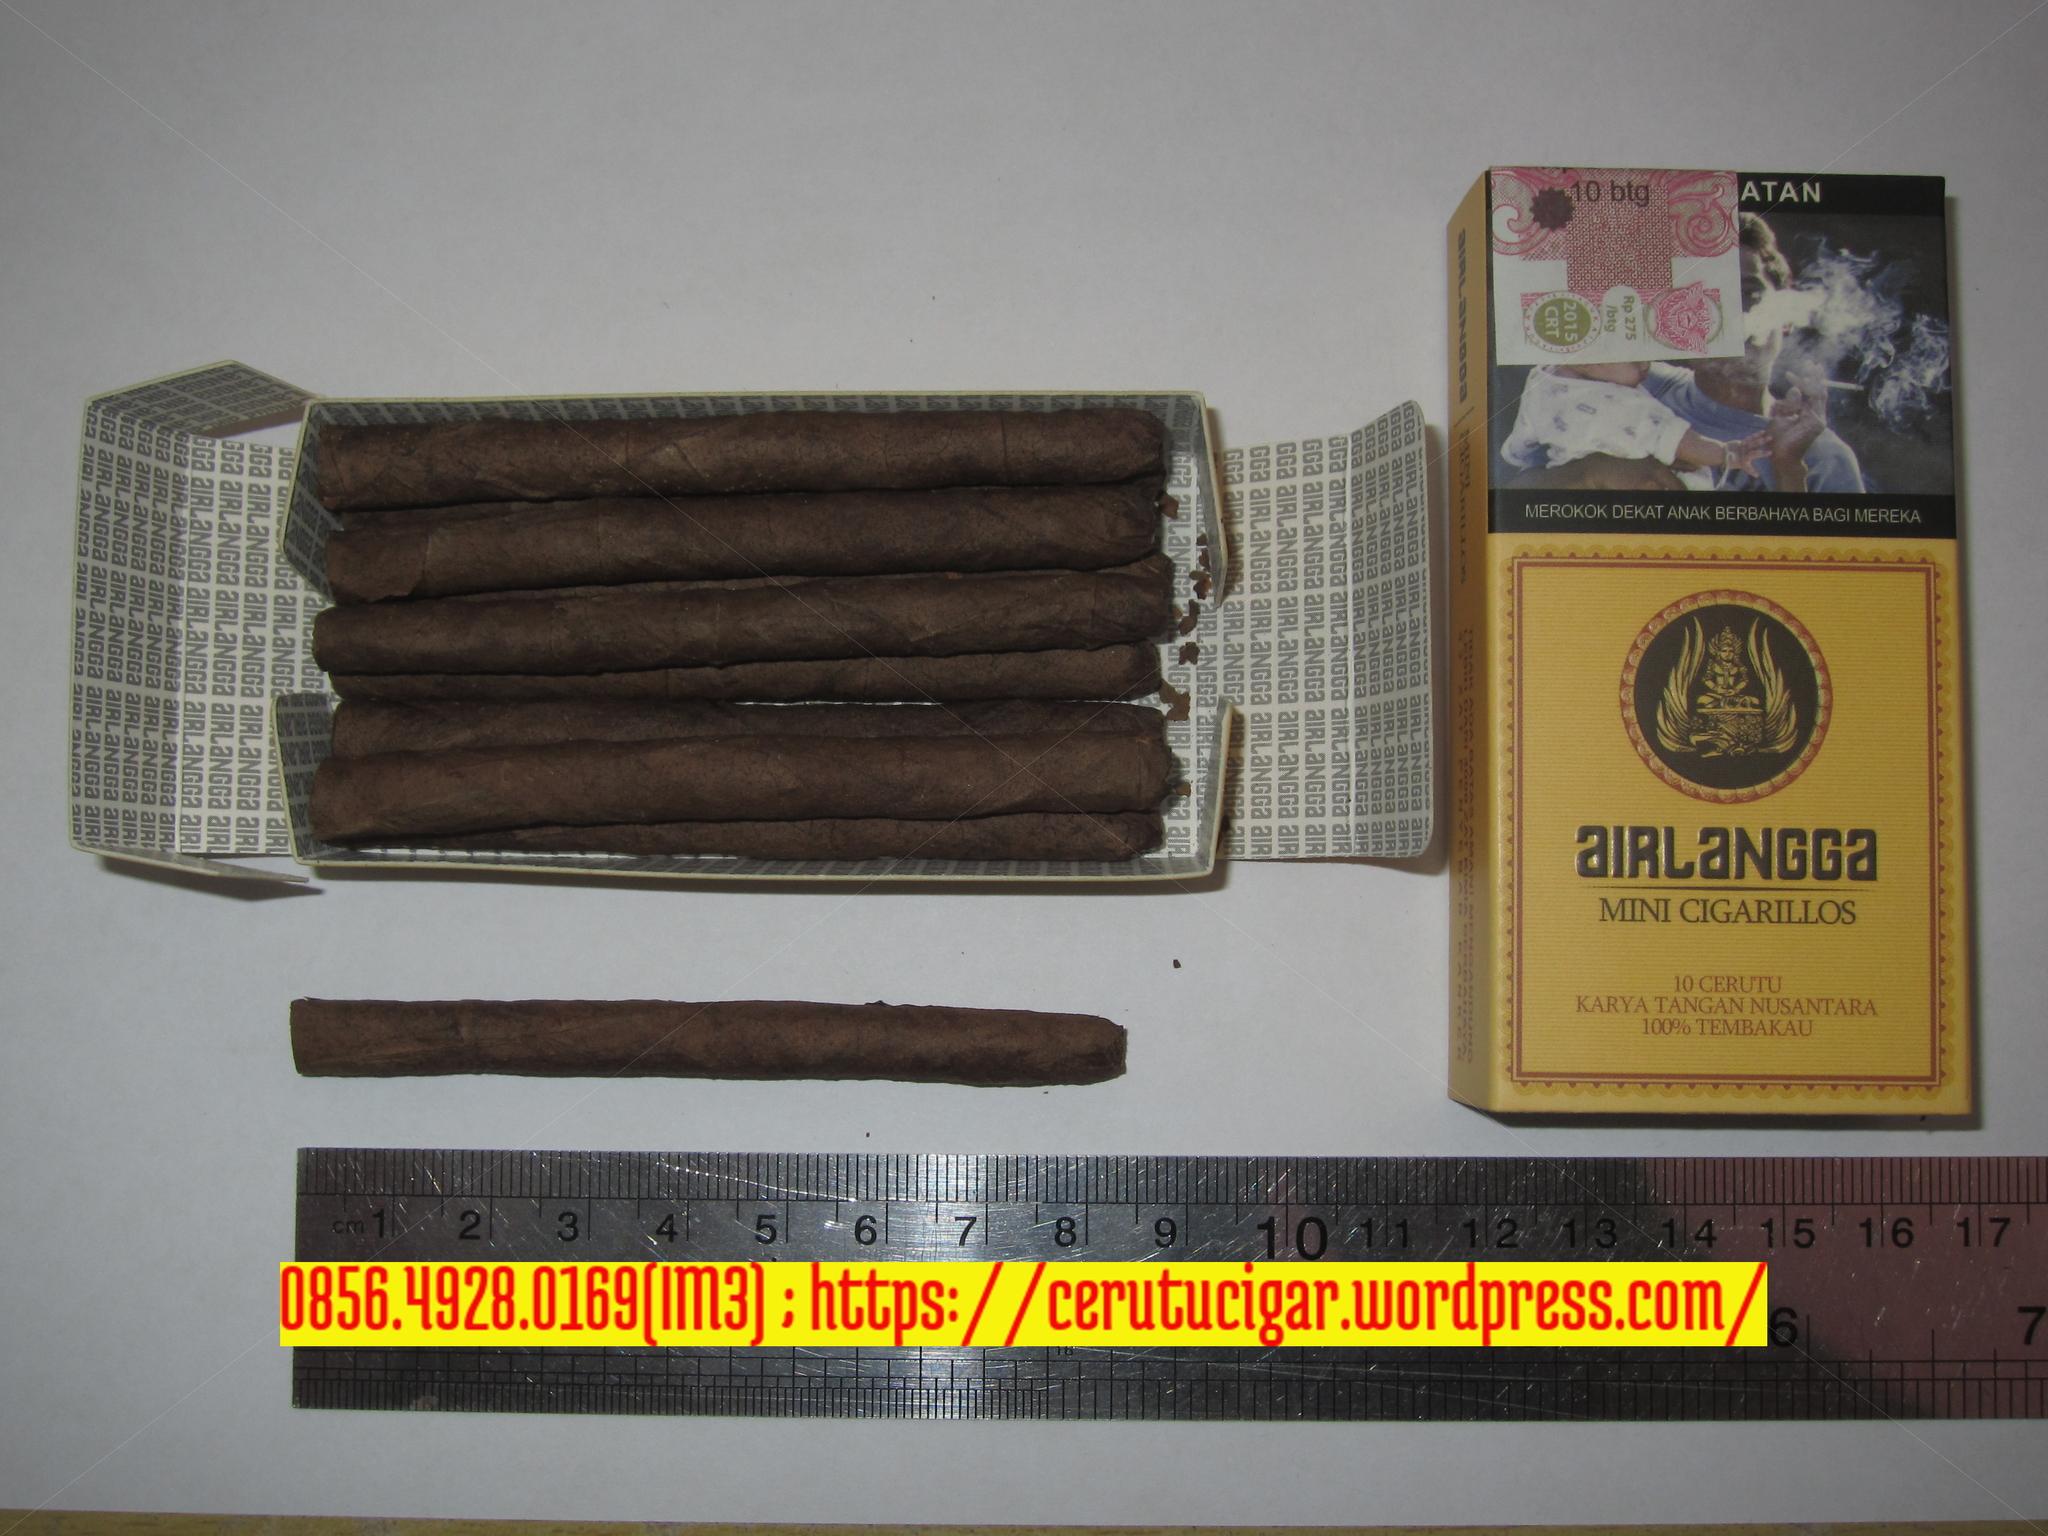 Jual Cerutu Airlangga Mini Cigarillos Cigar Premium Paket Dan Accesoris Emas Album Cream Tokopedia